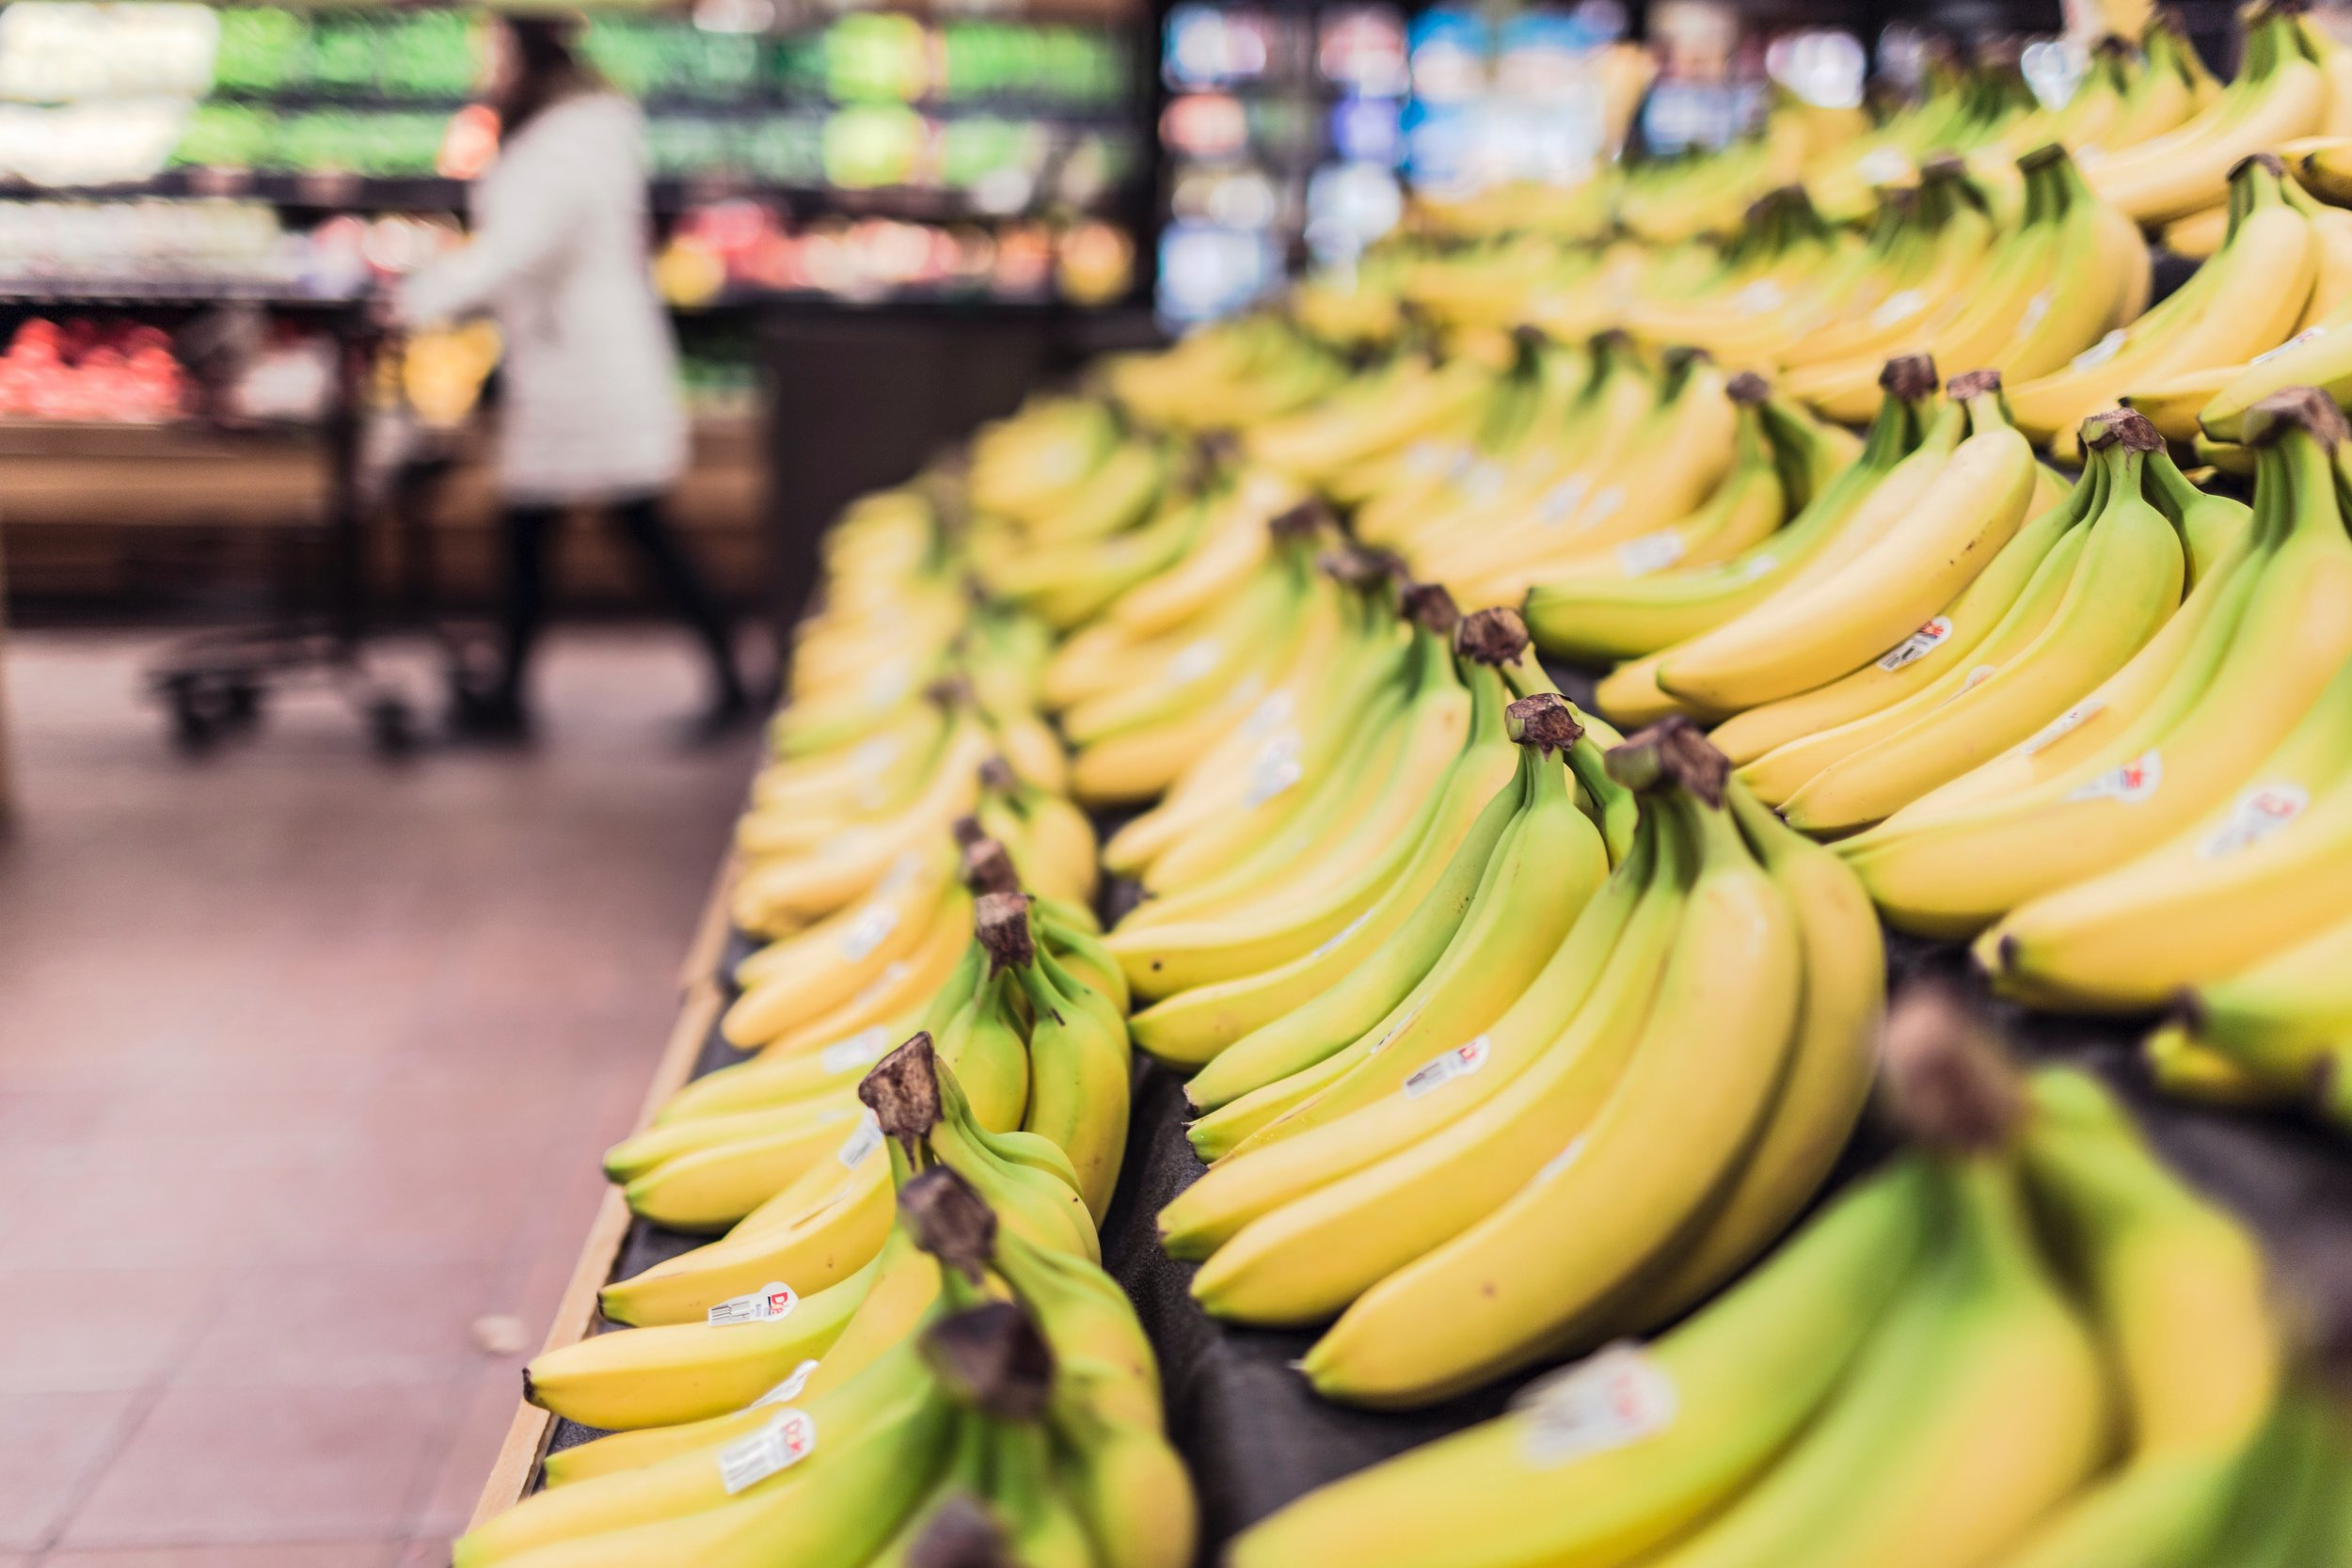 bananas-fruits-grocery.jpg